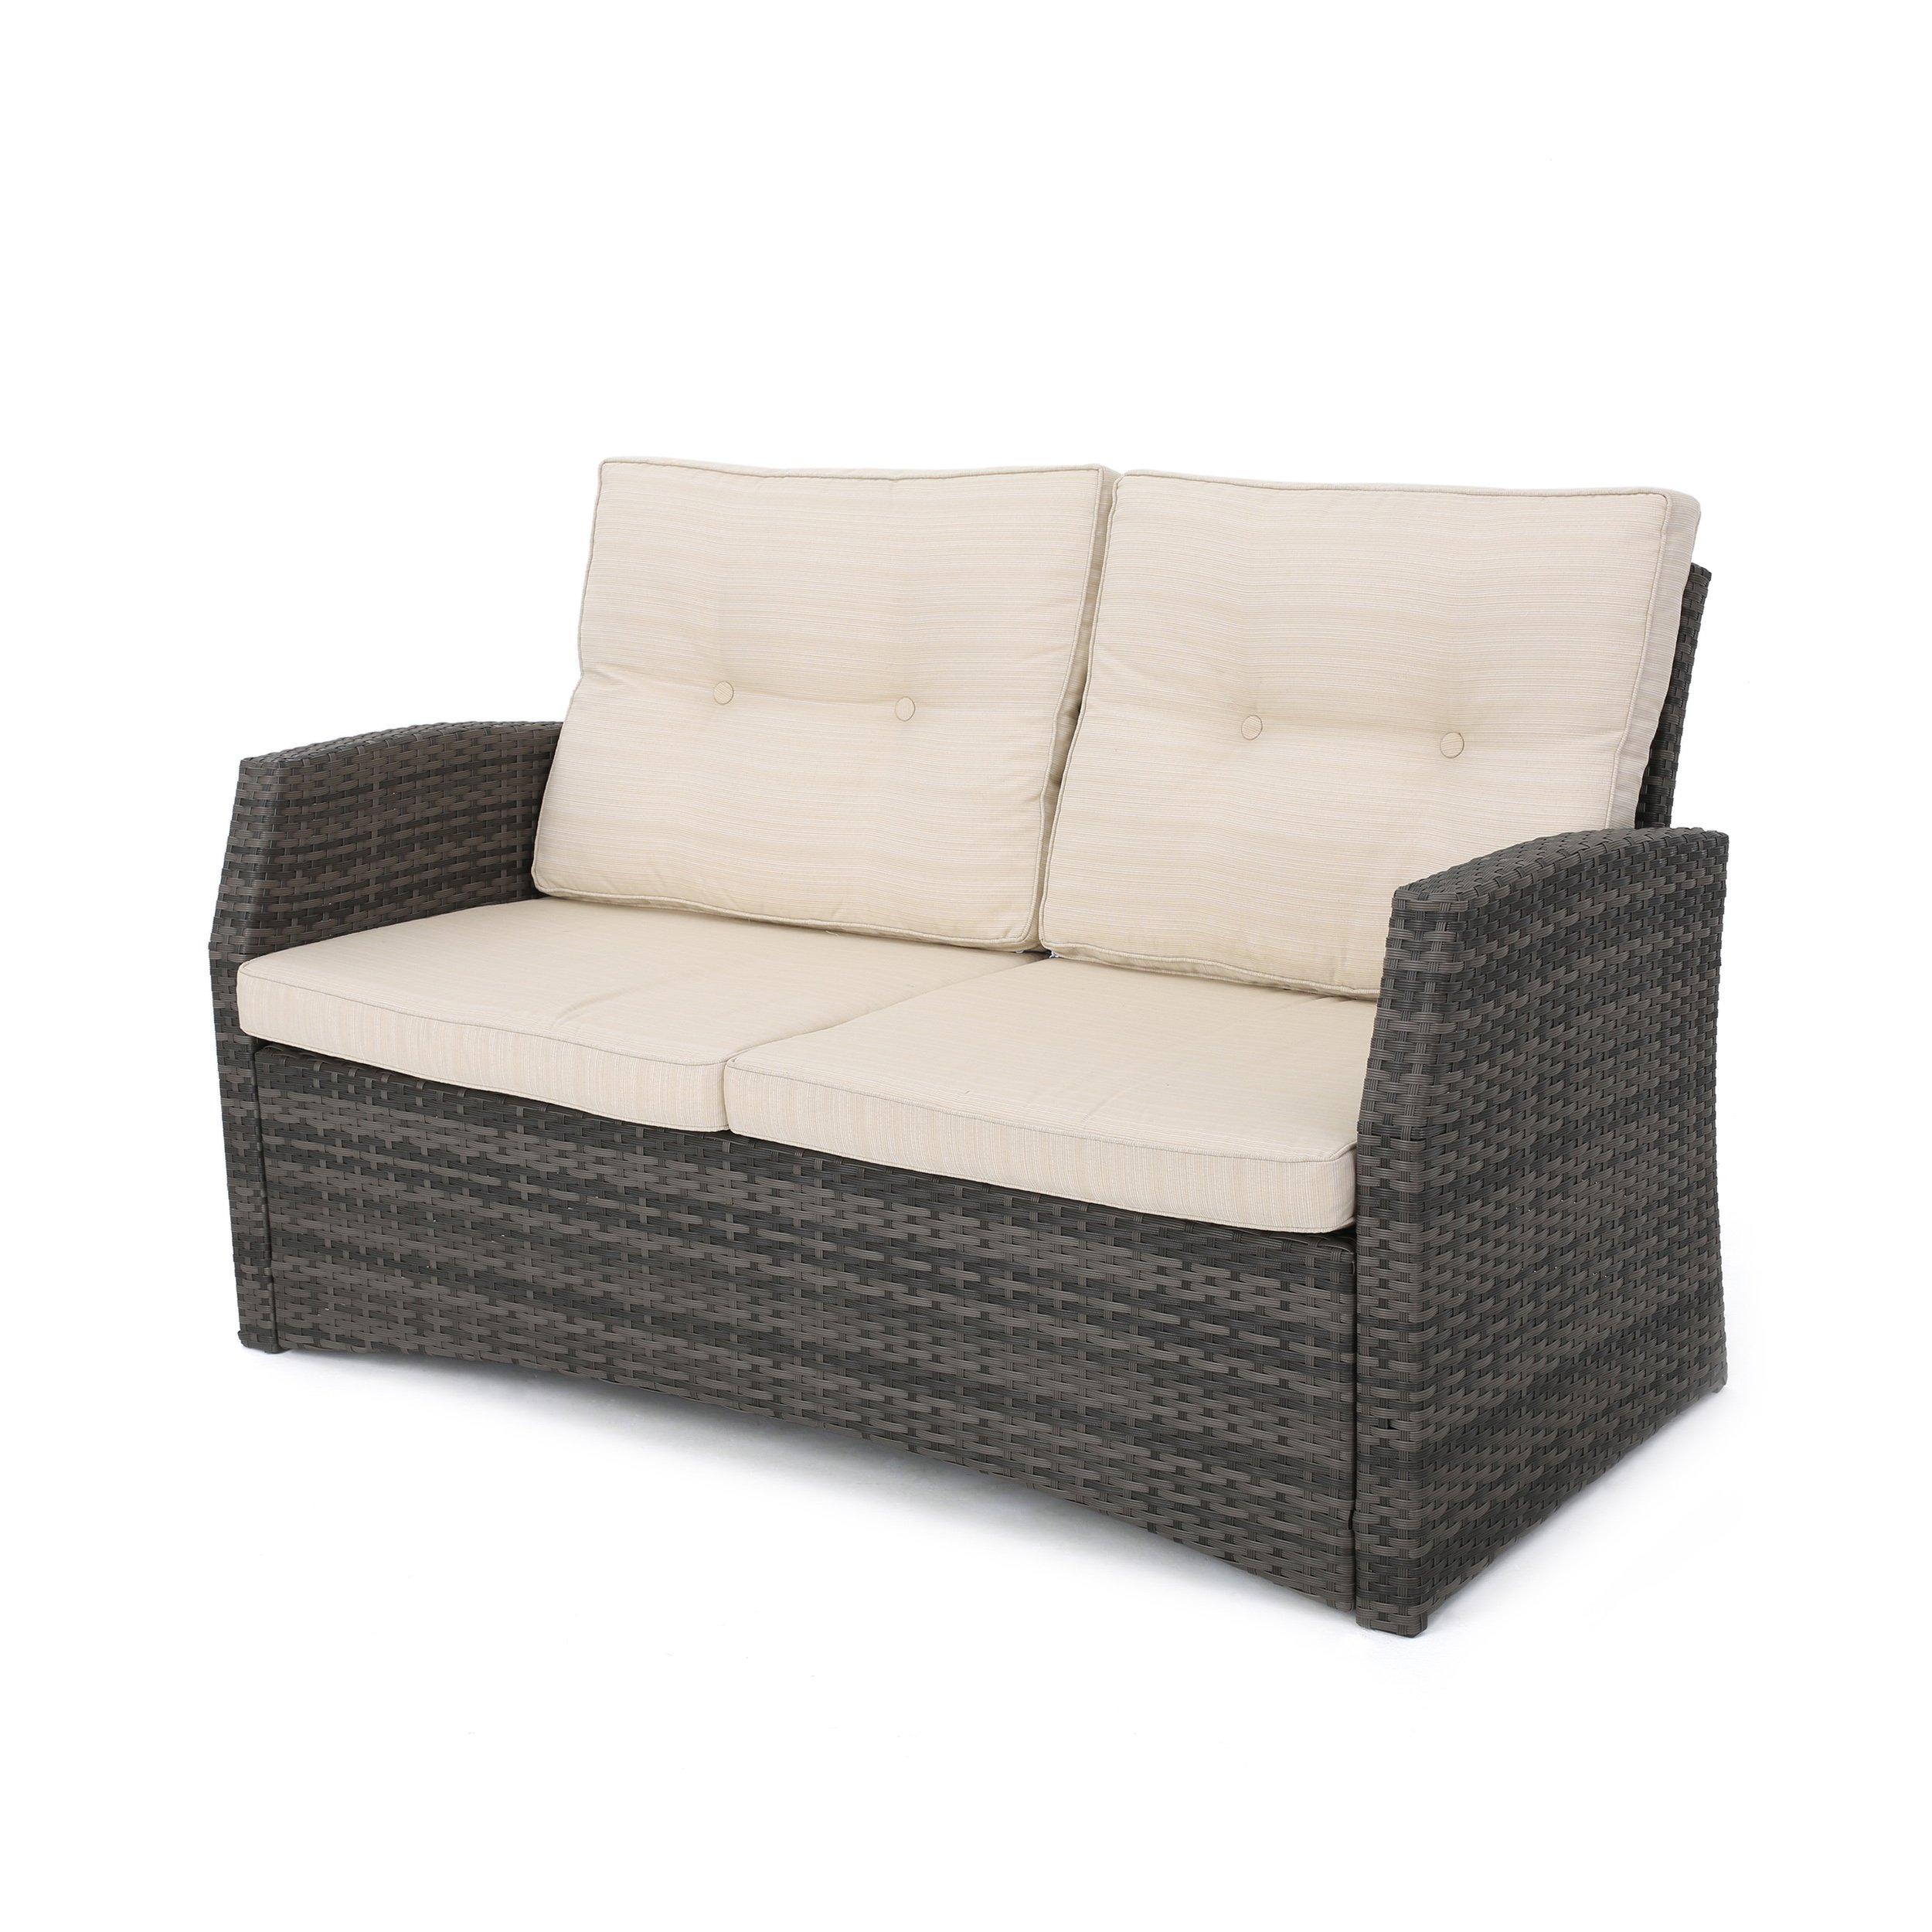 Great Deal Furniture Baldick Outdoor Wicker Loveseat, Gray